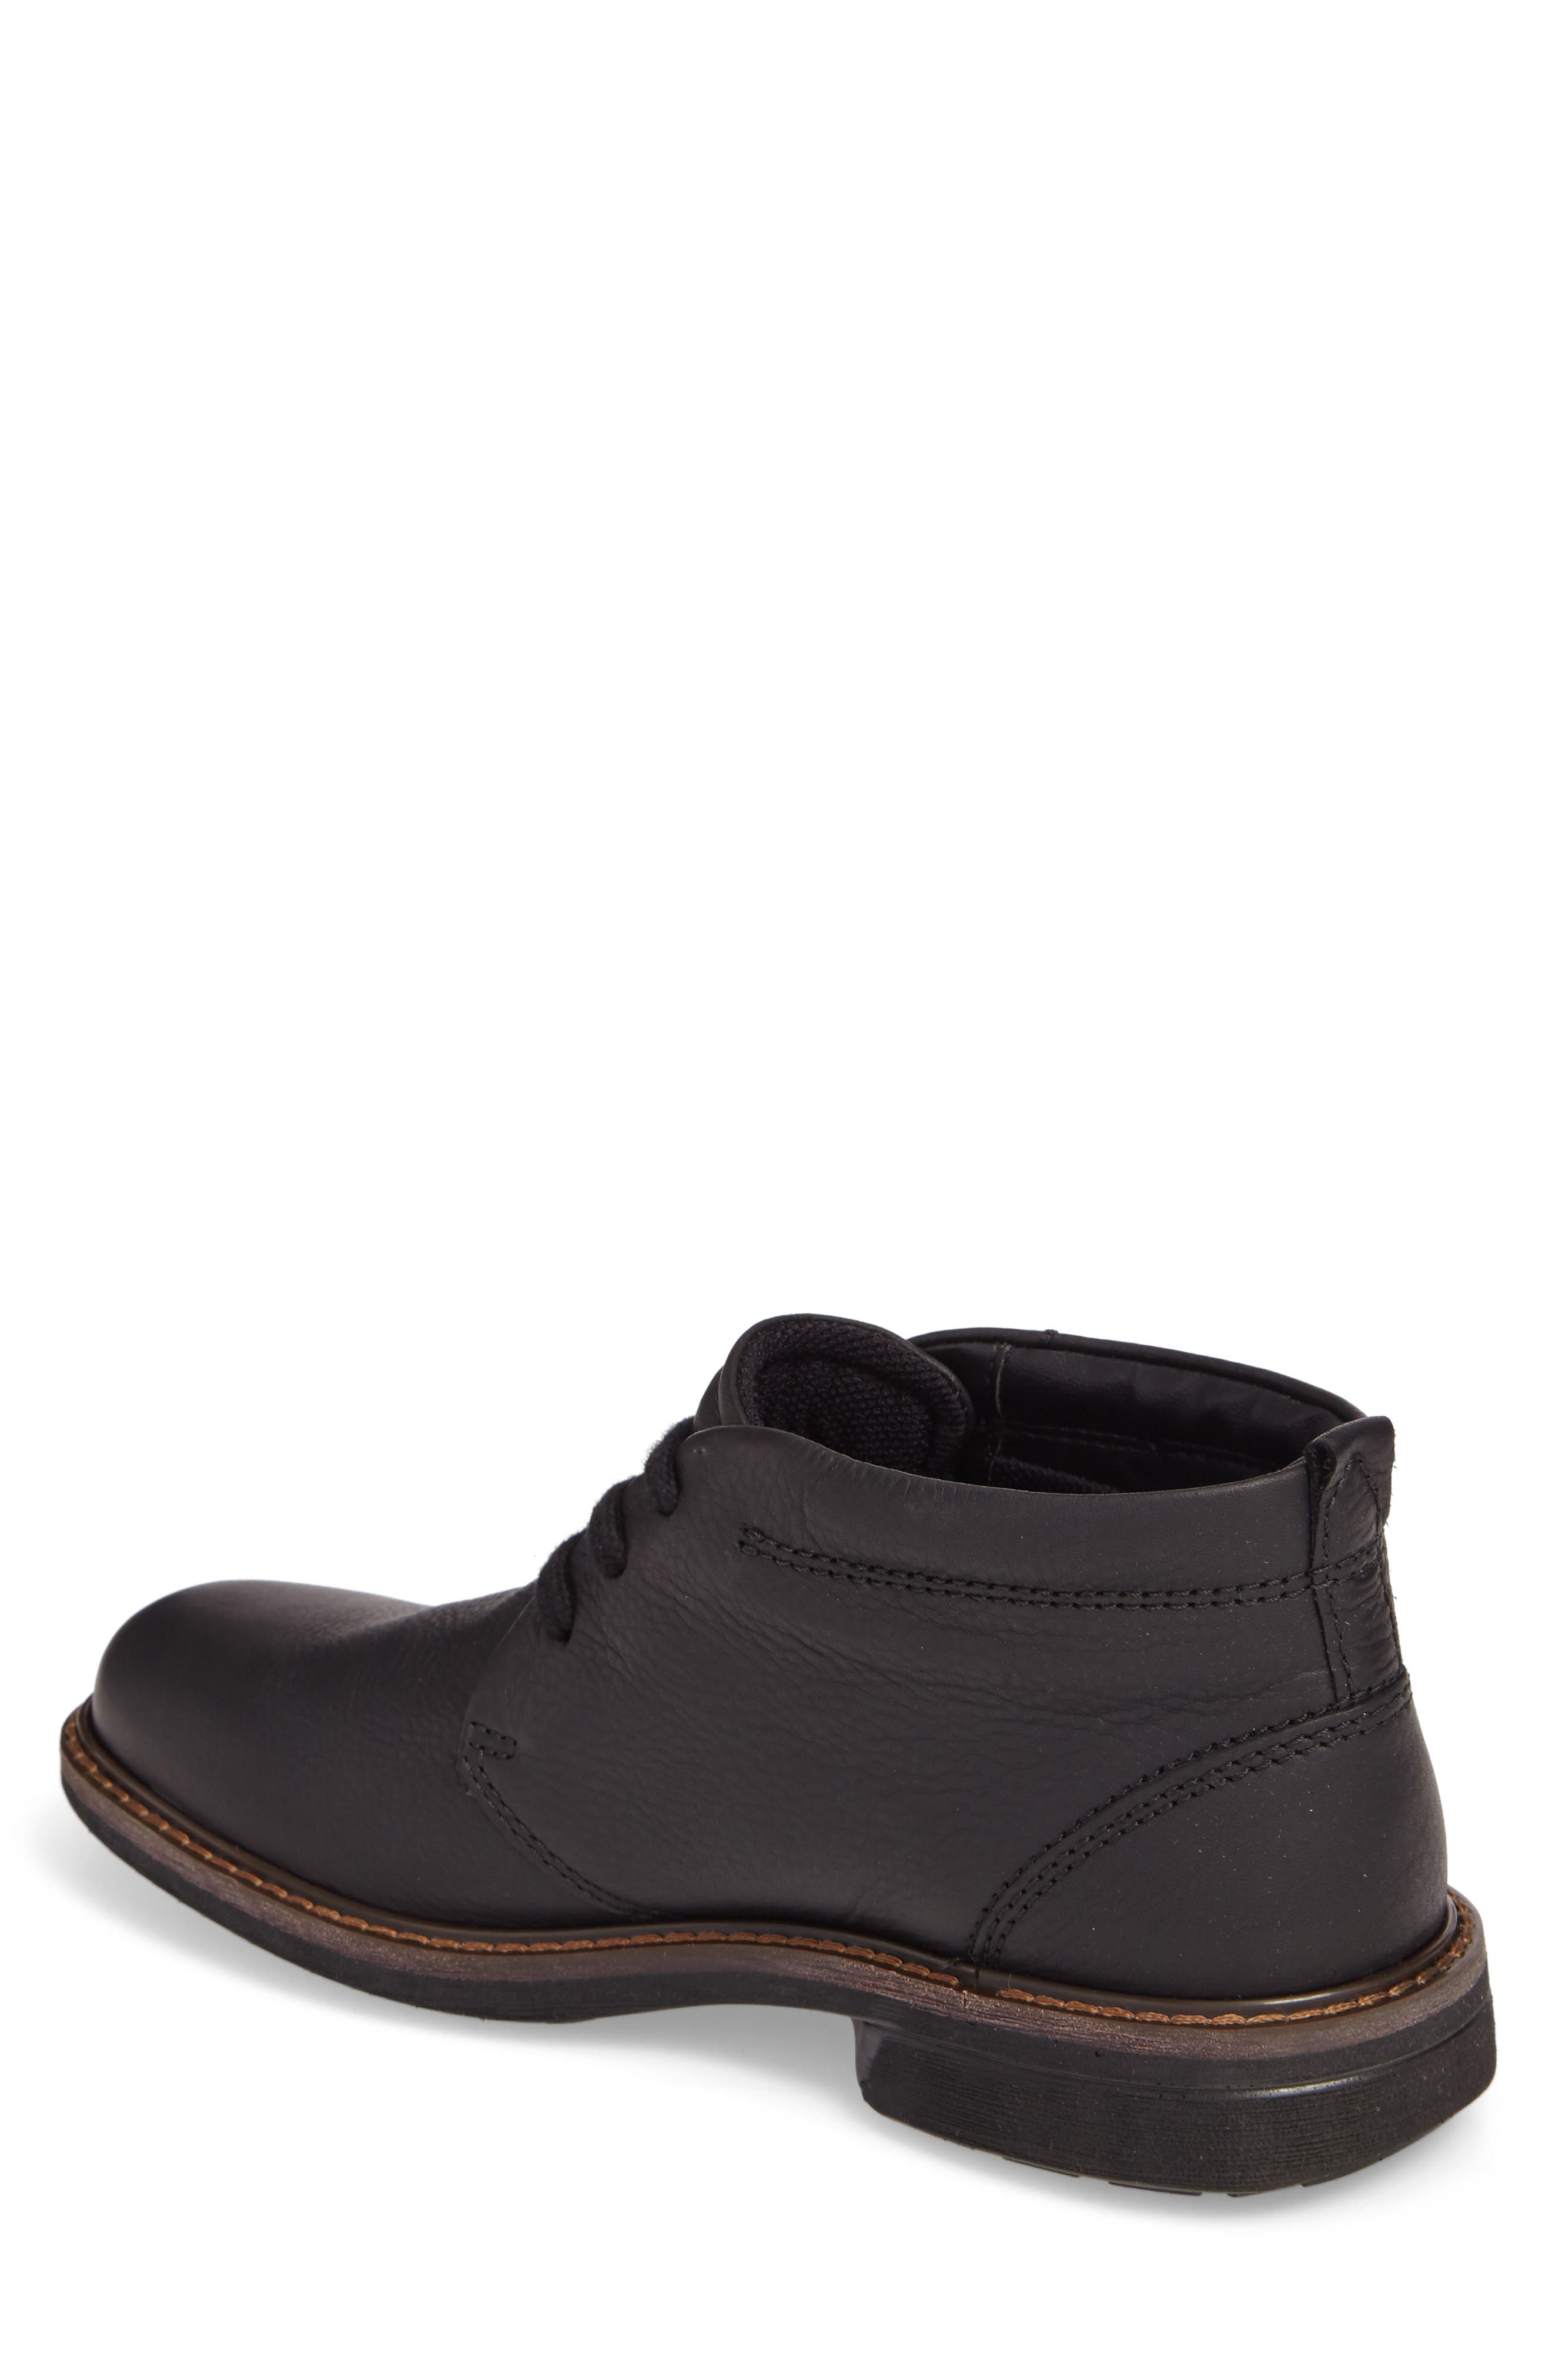 Turn Gore-Tex<sup>®</sup> Waterproof Chukka Boot,                             Alternate thumbnail 2, color,                             Black Nubuck